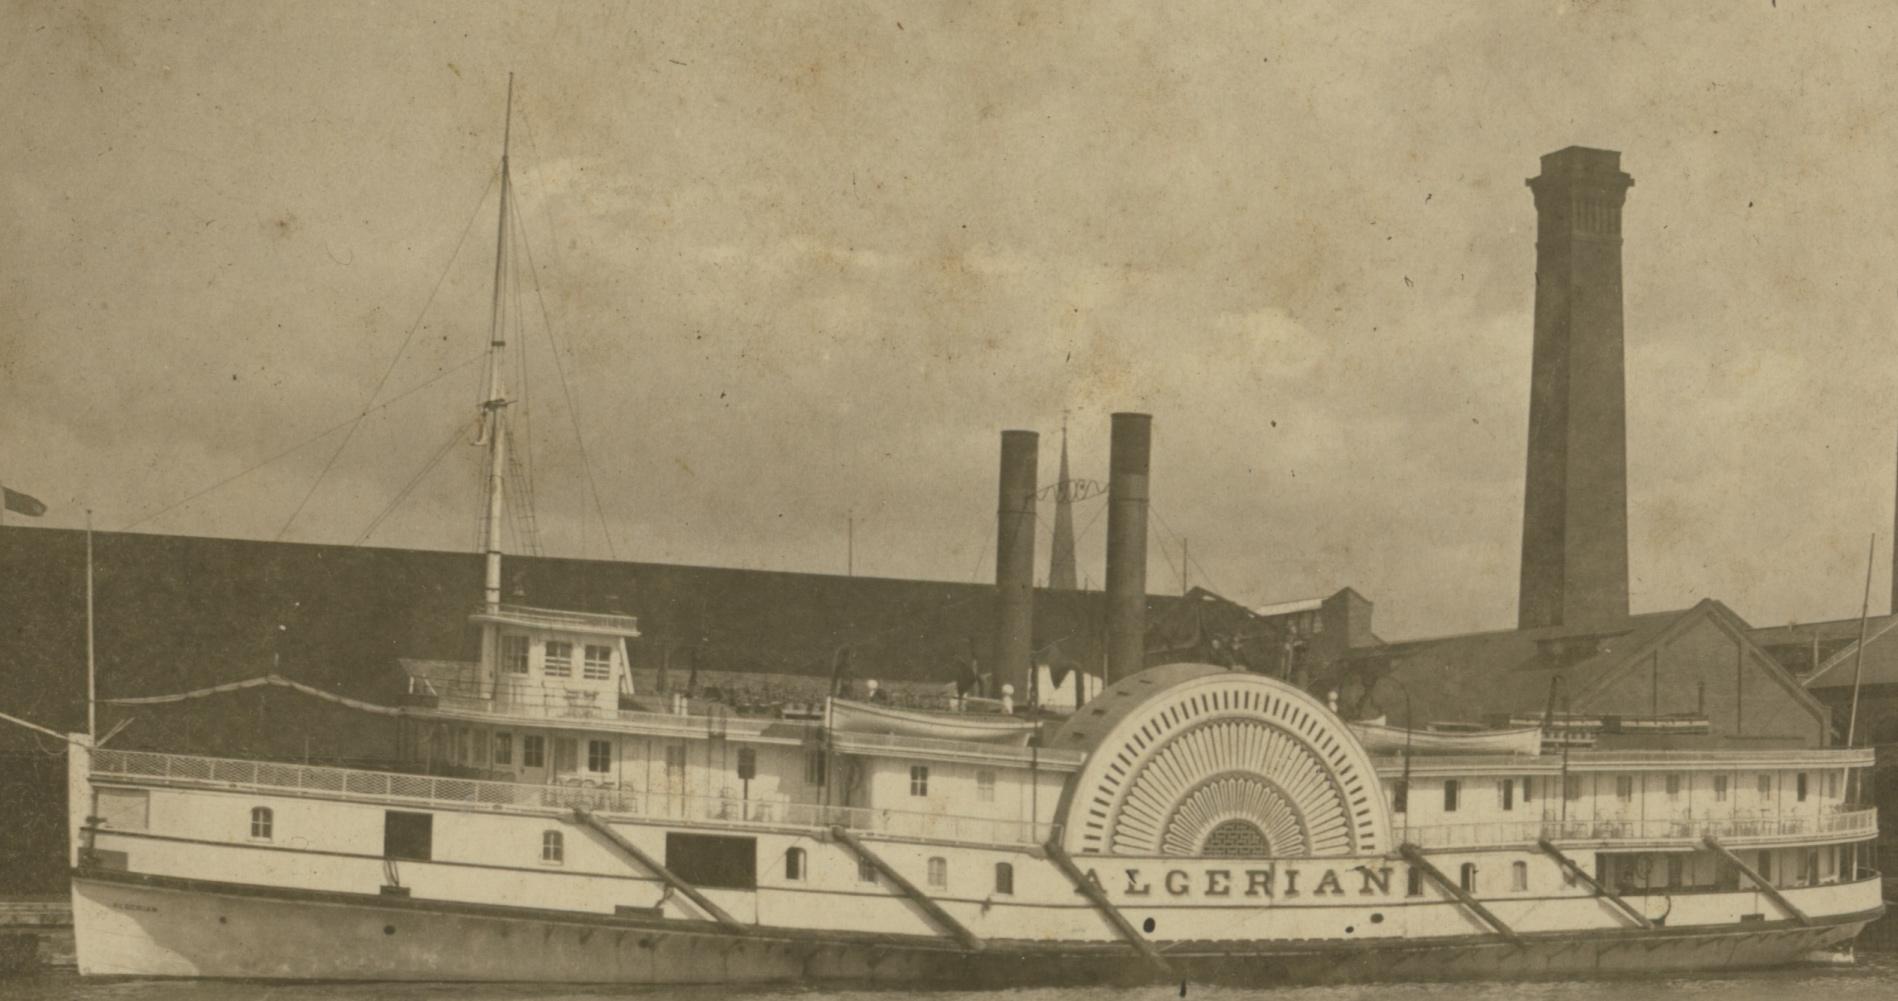 ALGERIAN at Toronto Electric Light Co. Wharf